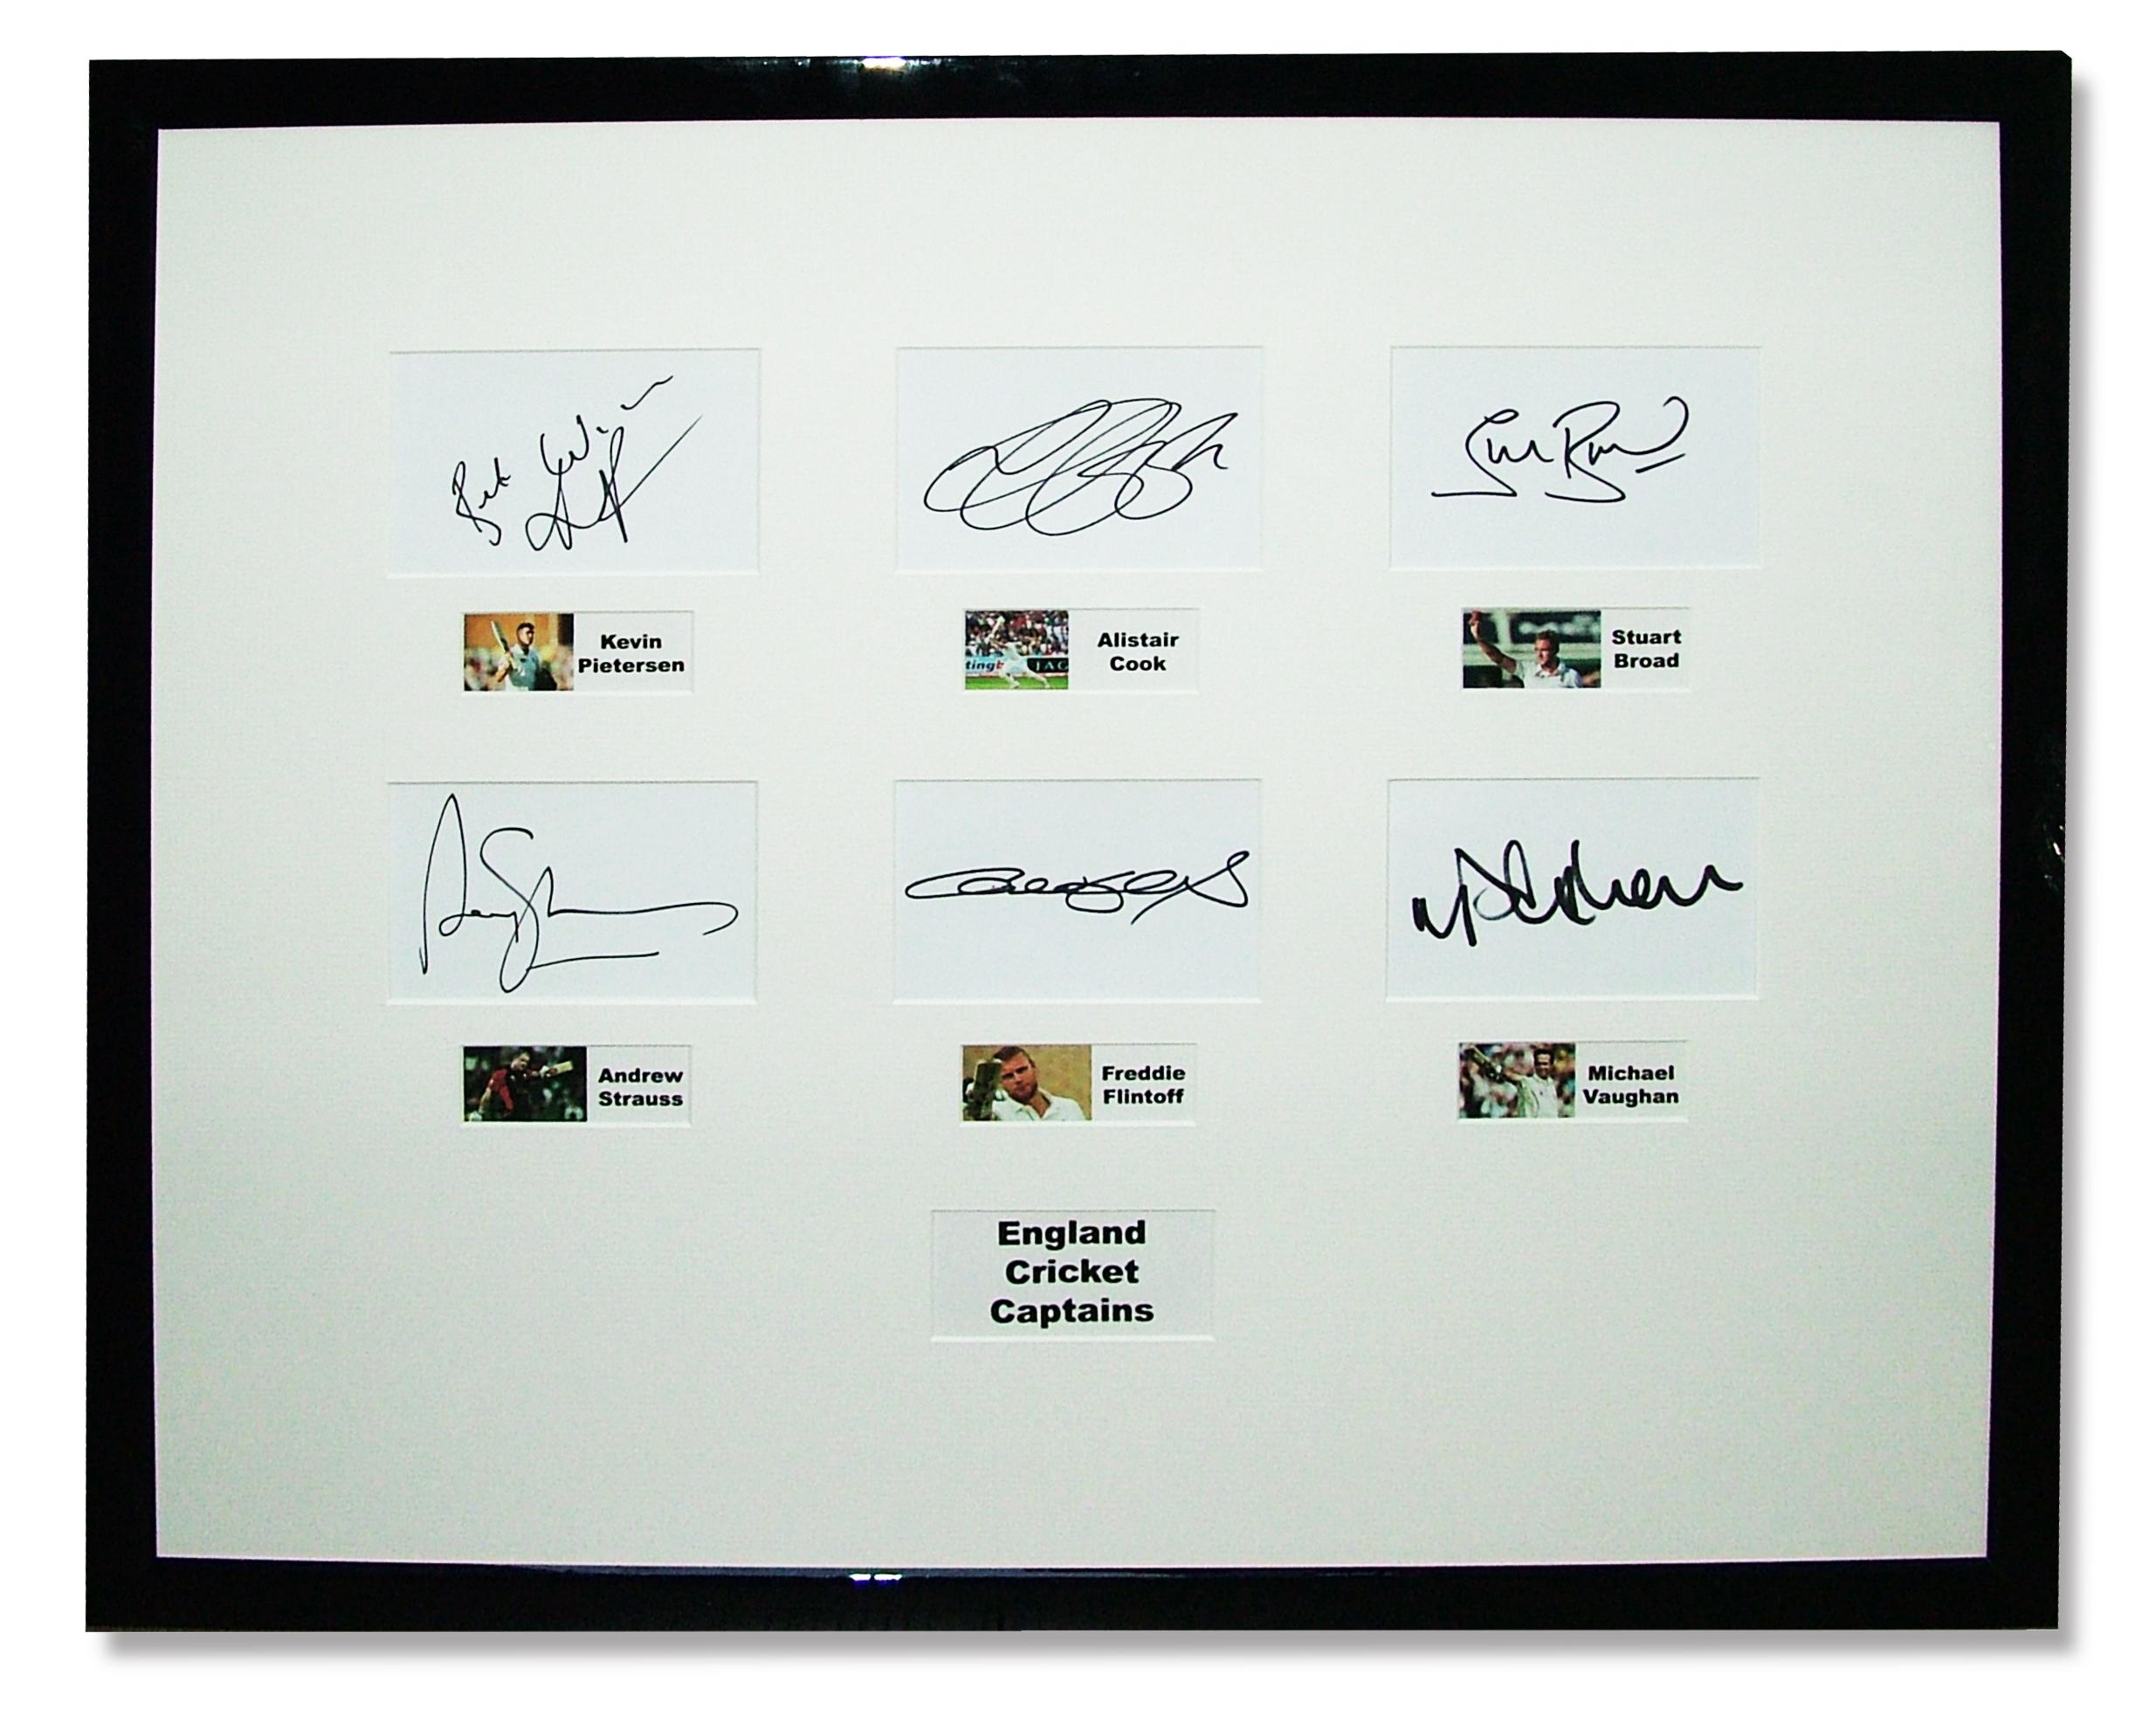 england-cricket-captains-autograph-collection